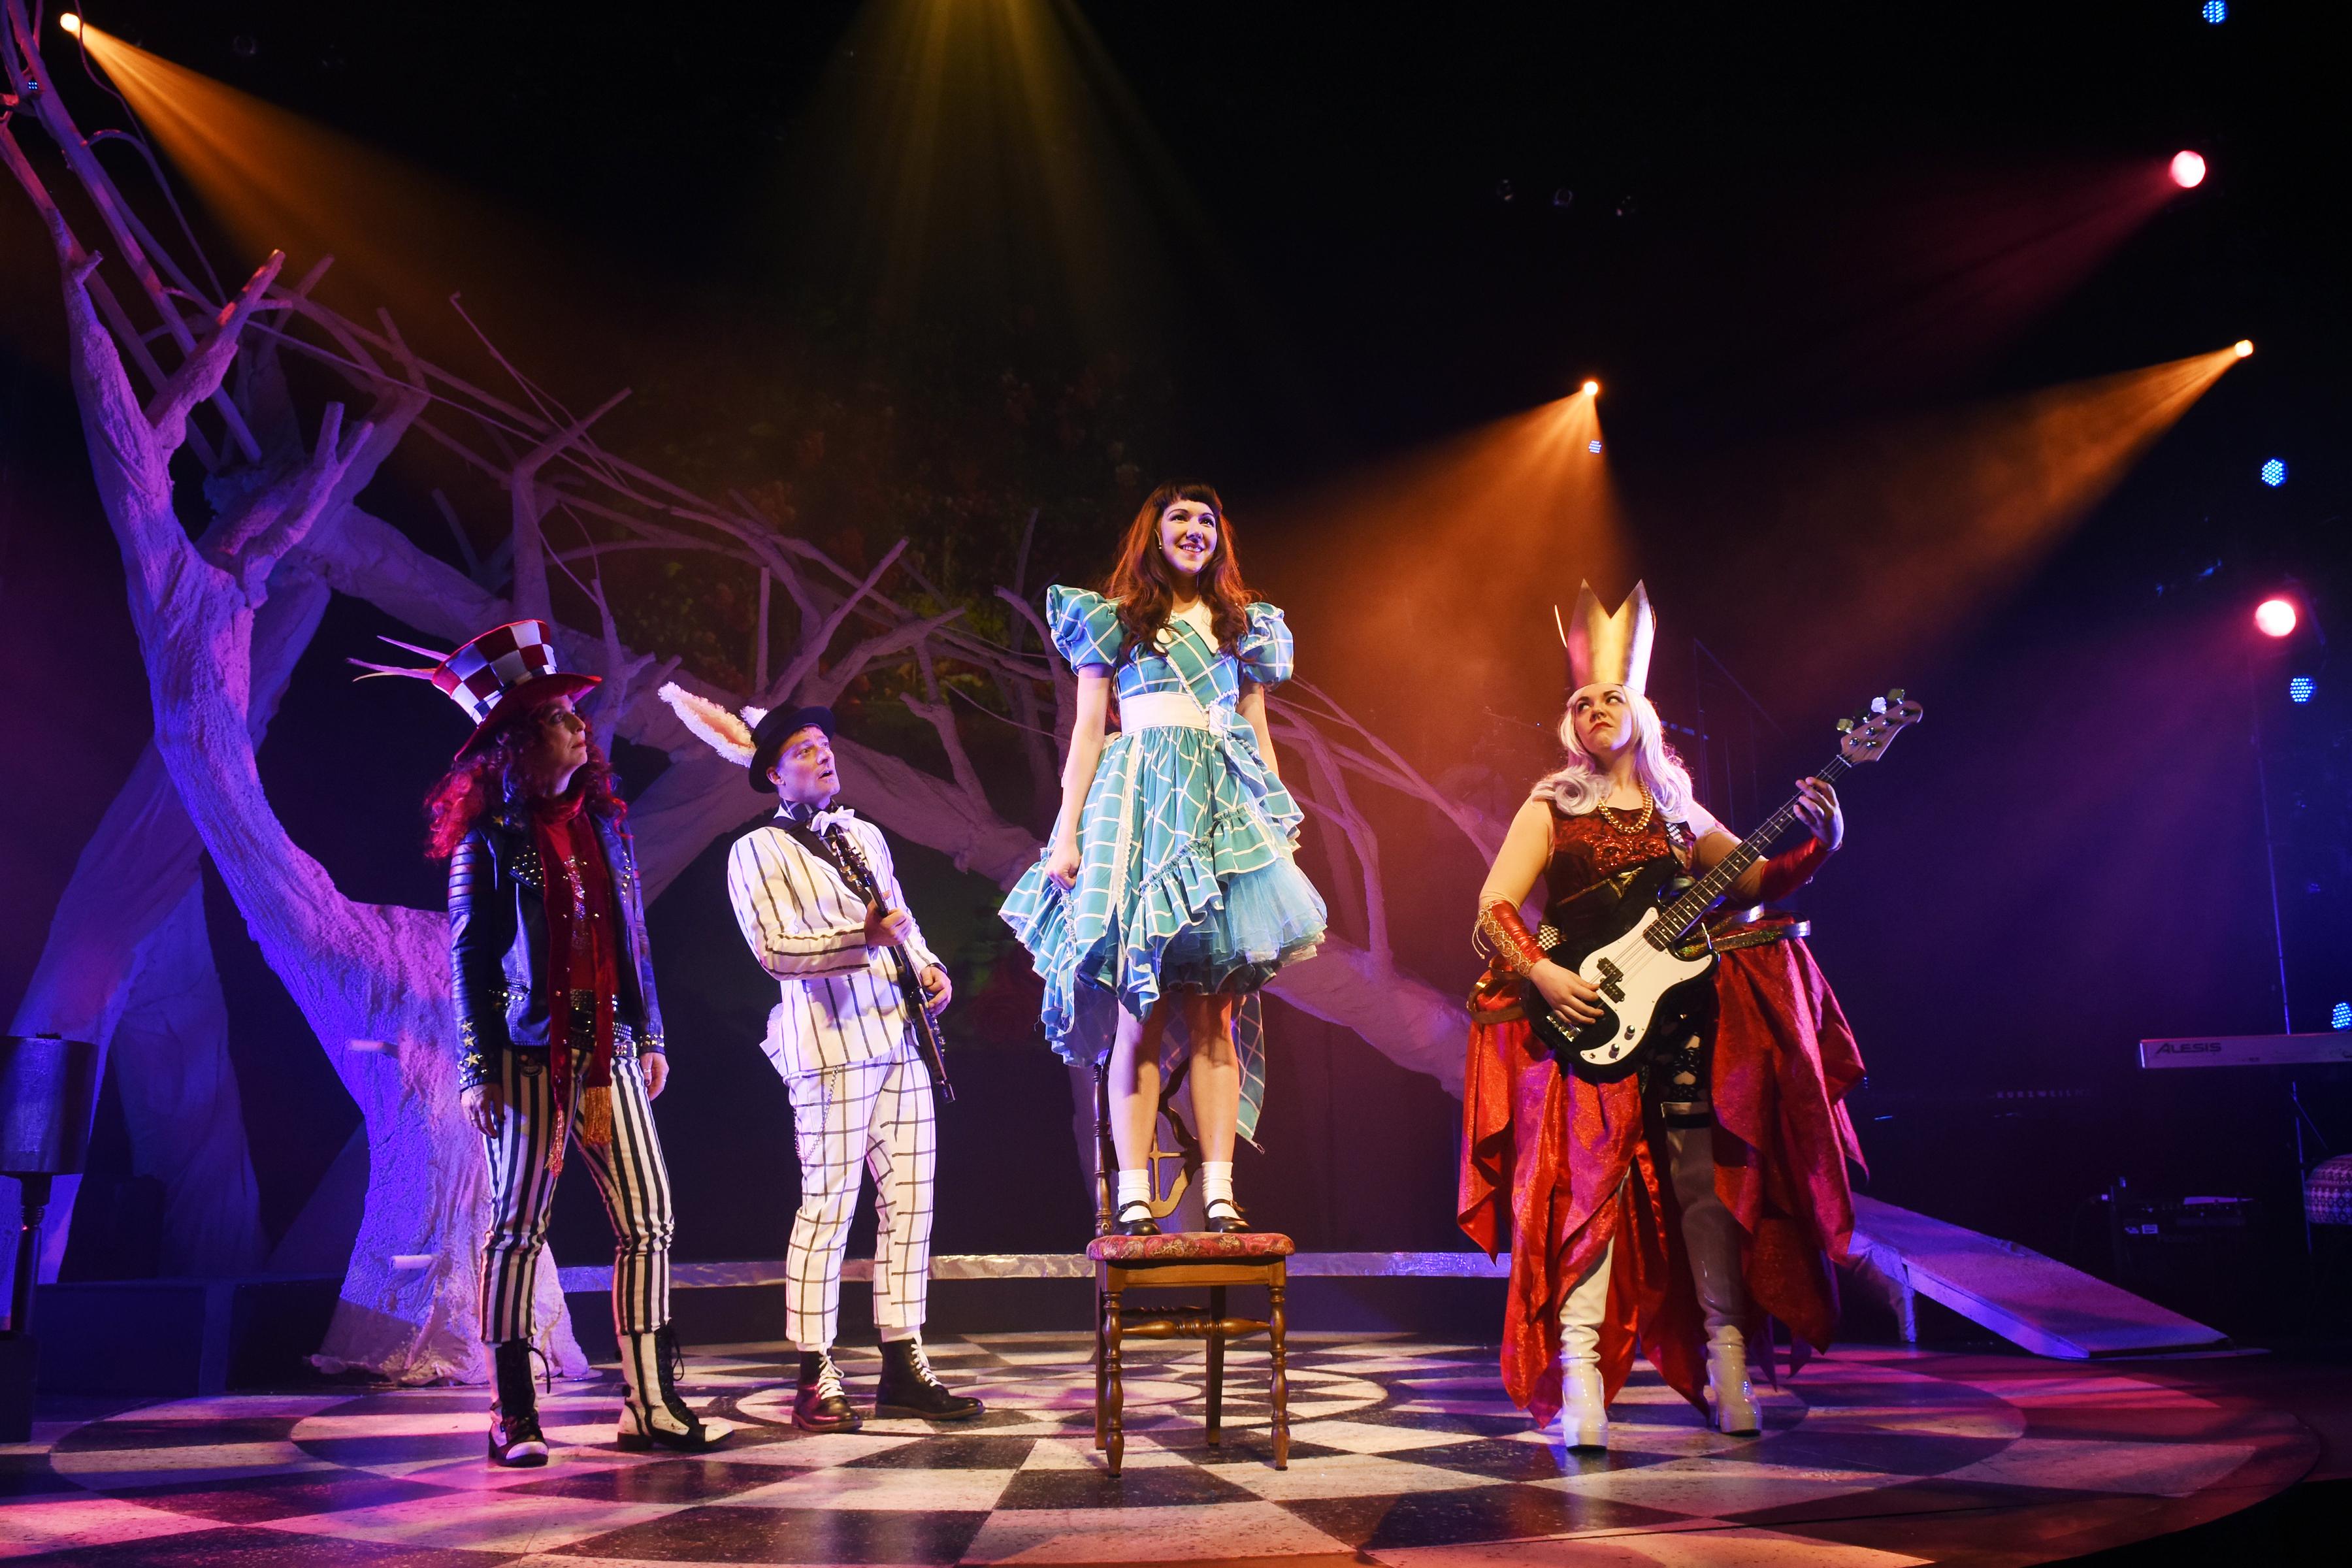 BWW Review: WONDERLAND: ALICE'S ROCK & ROLL ADVENTURE at Childsplay